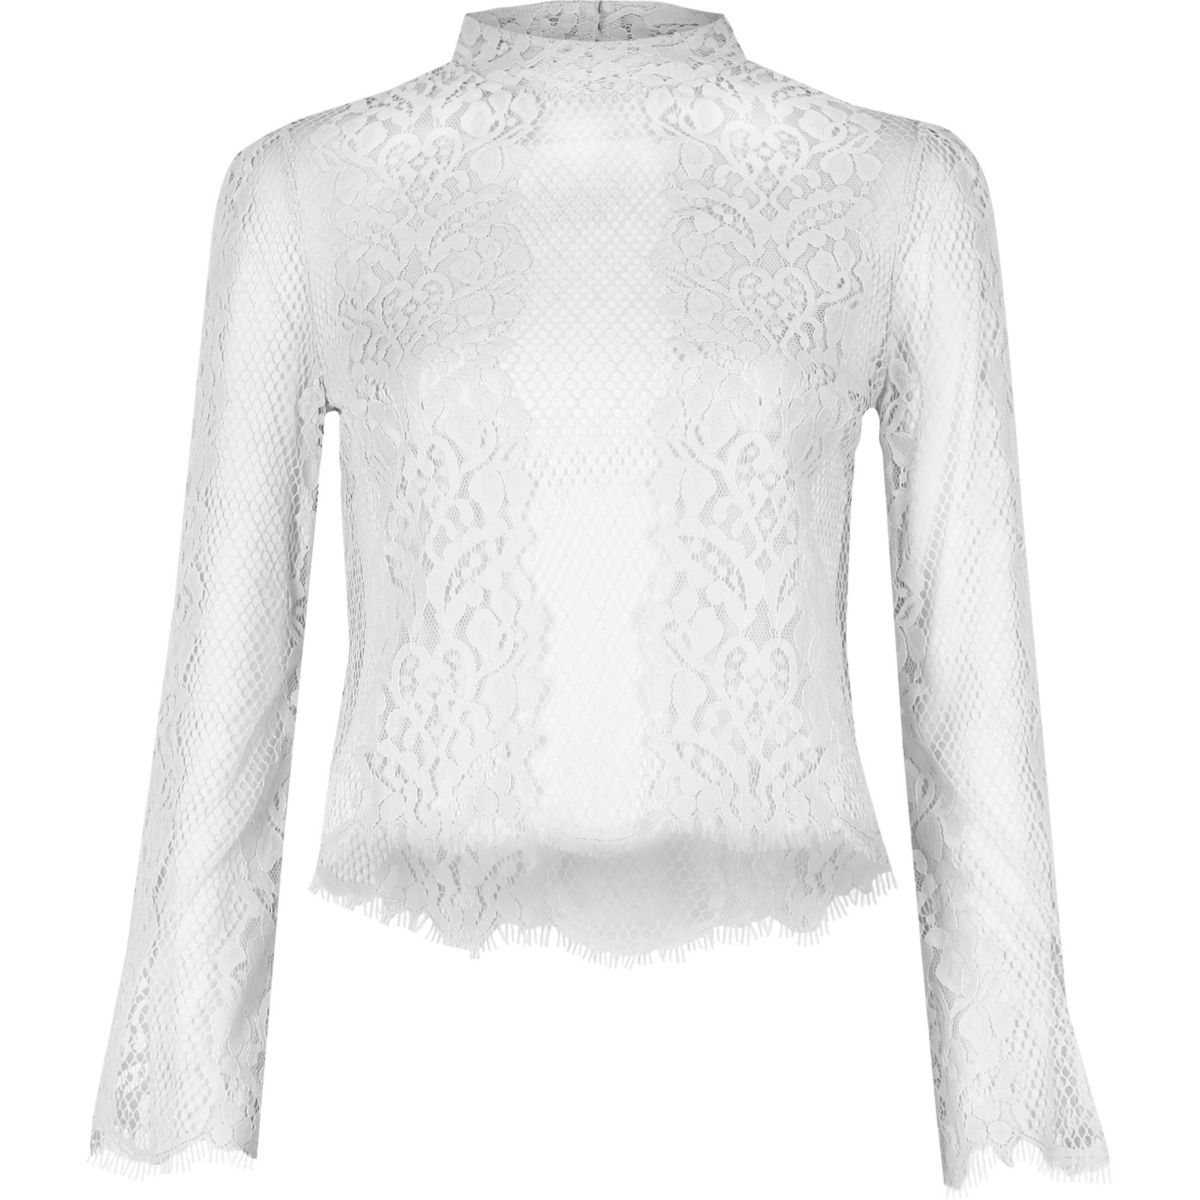 Cream lace flute top